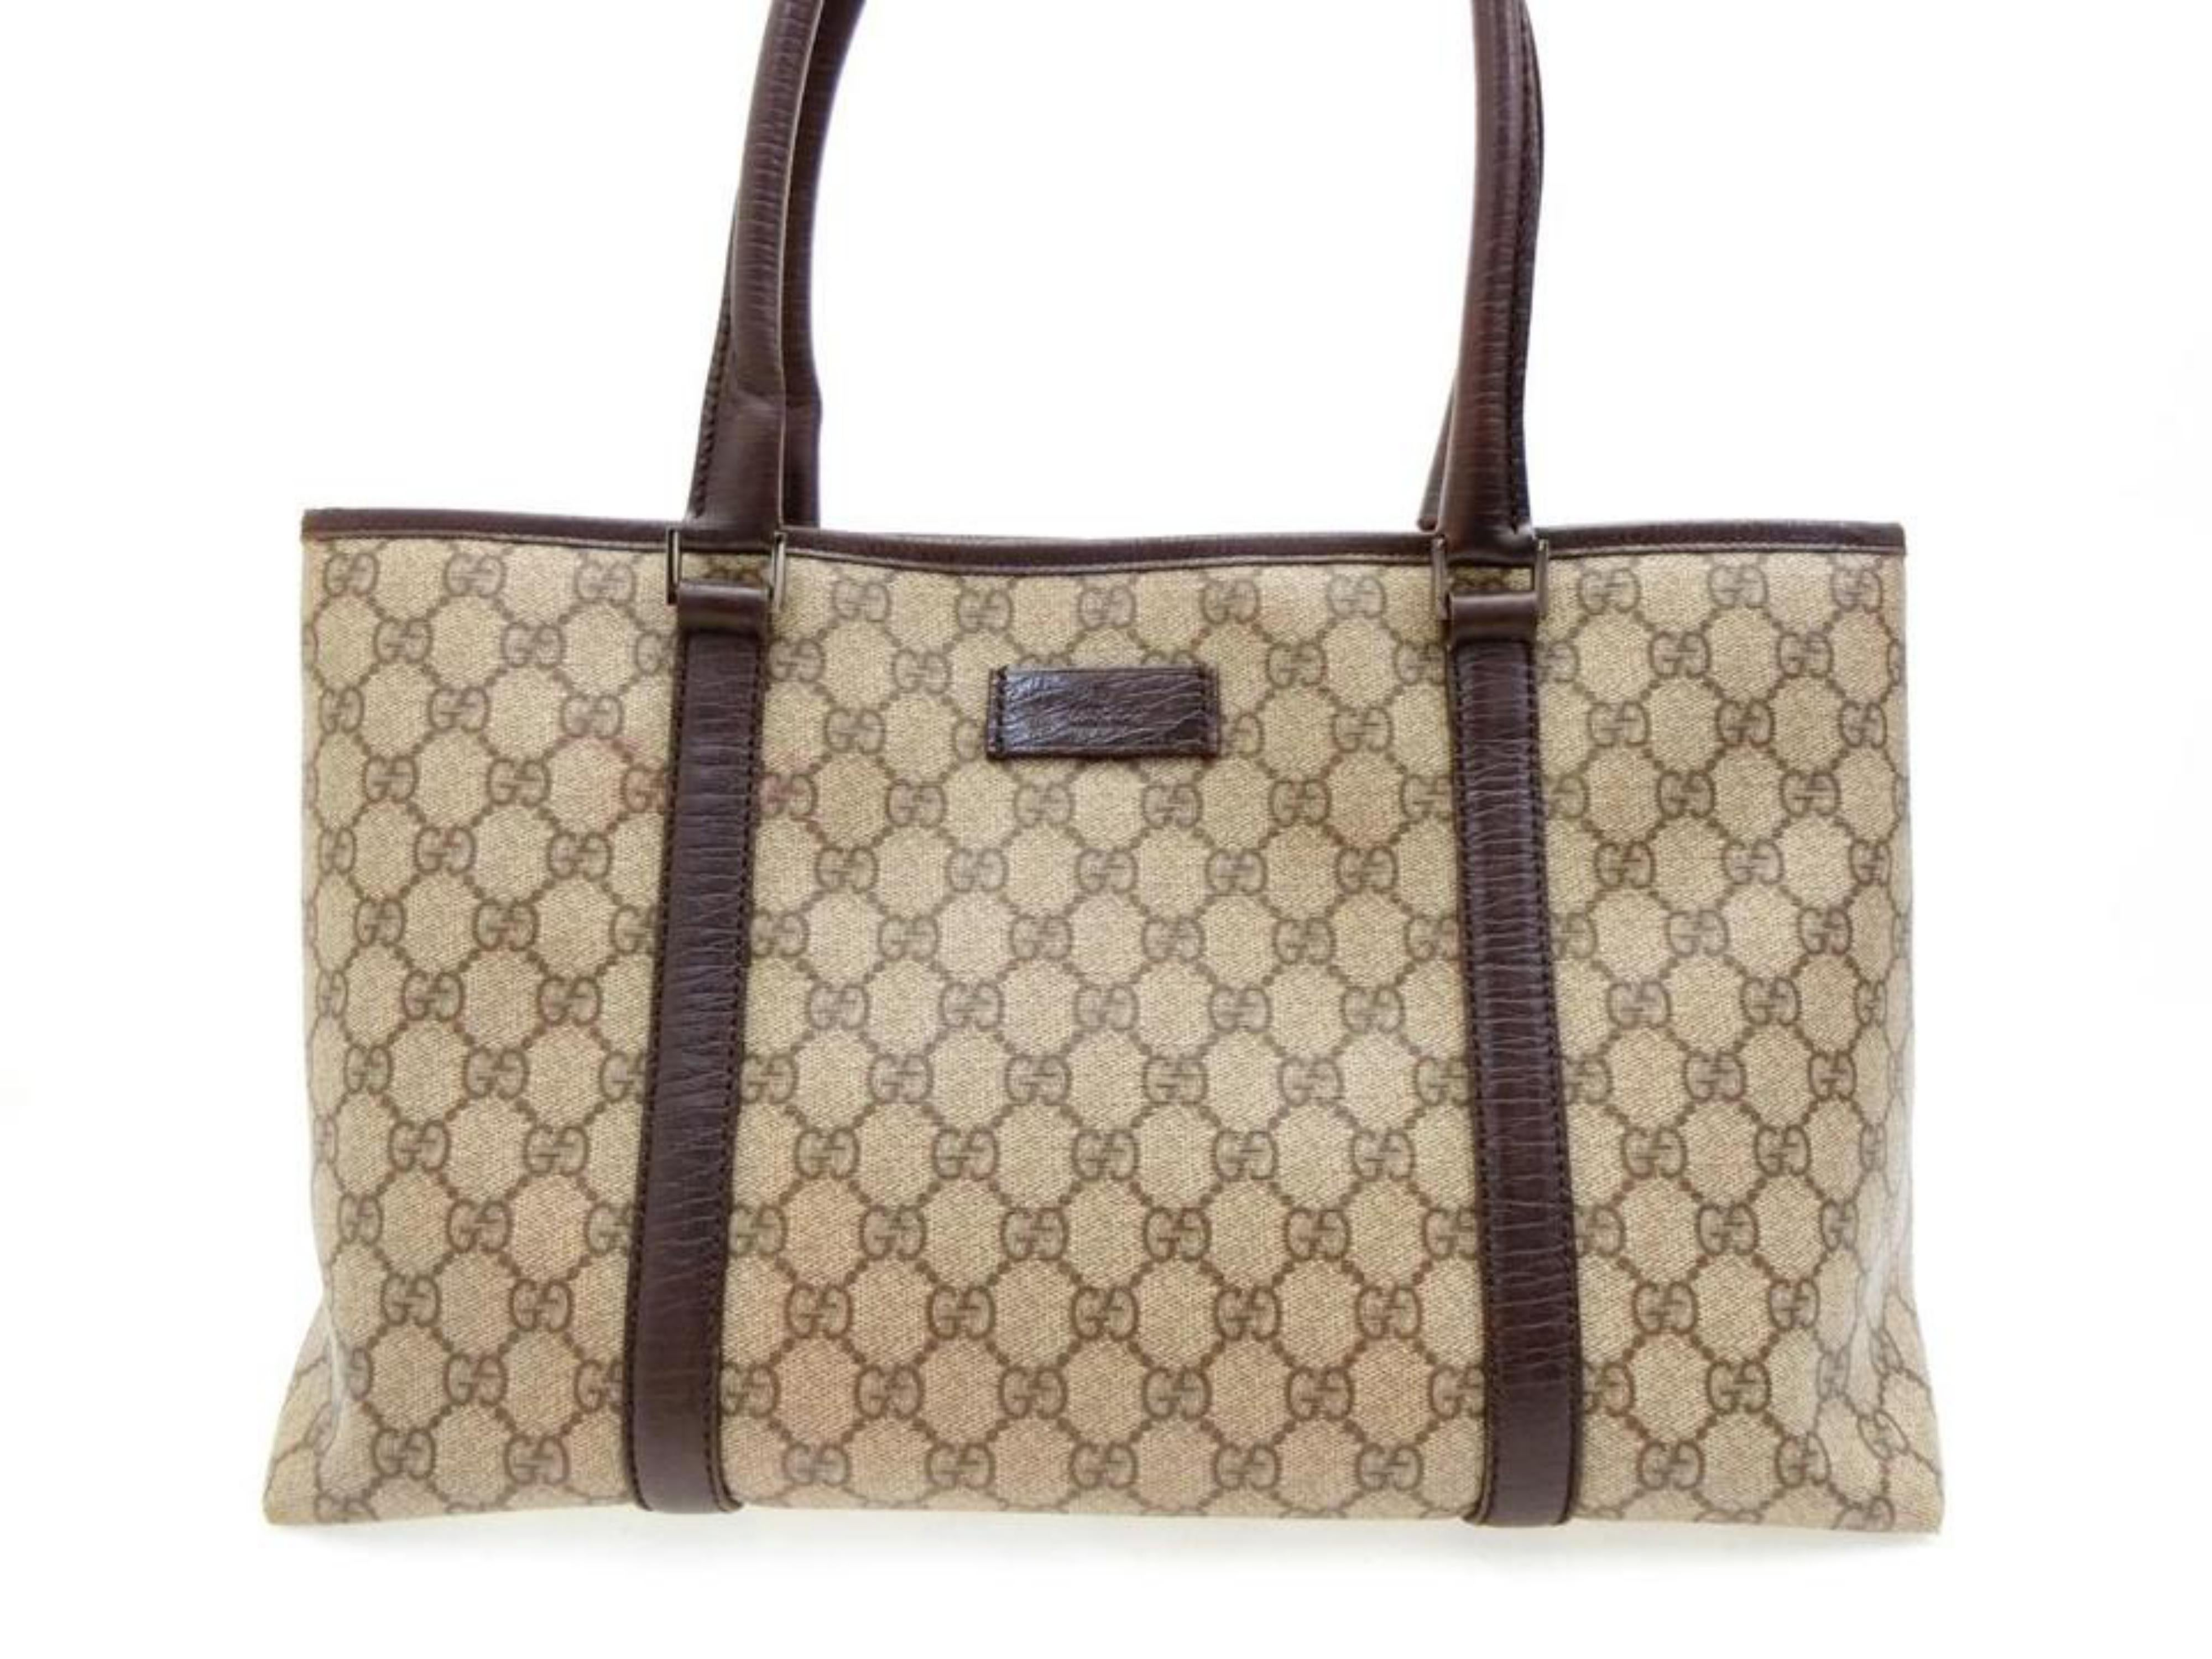 9d1b61cf970 Gucci Supreme Gg Monogram Shopper 228812 Brown Coated Canvas Tote at 1stdibs